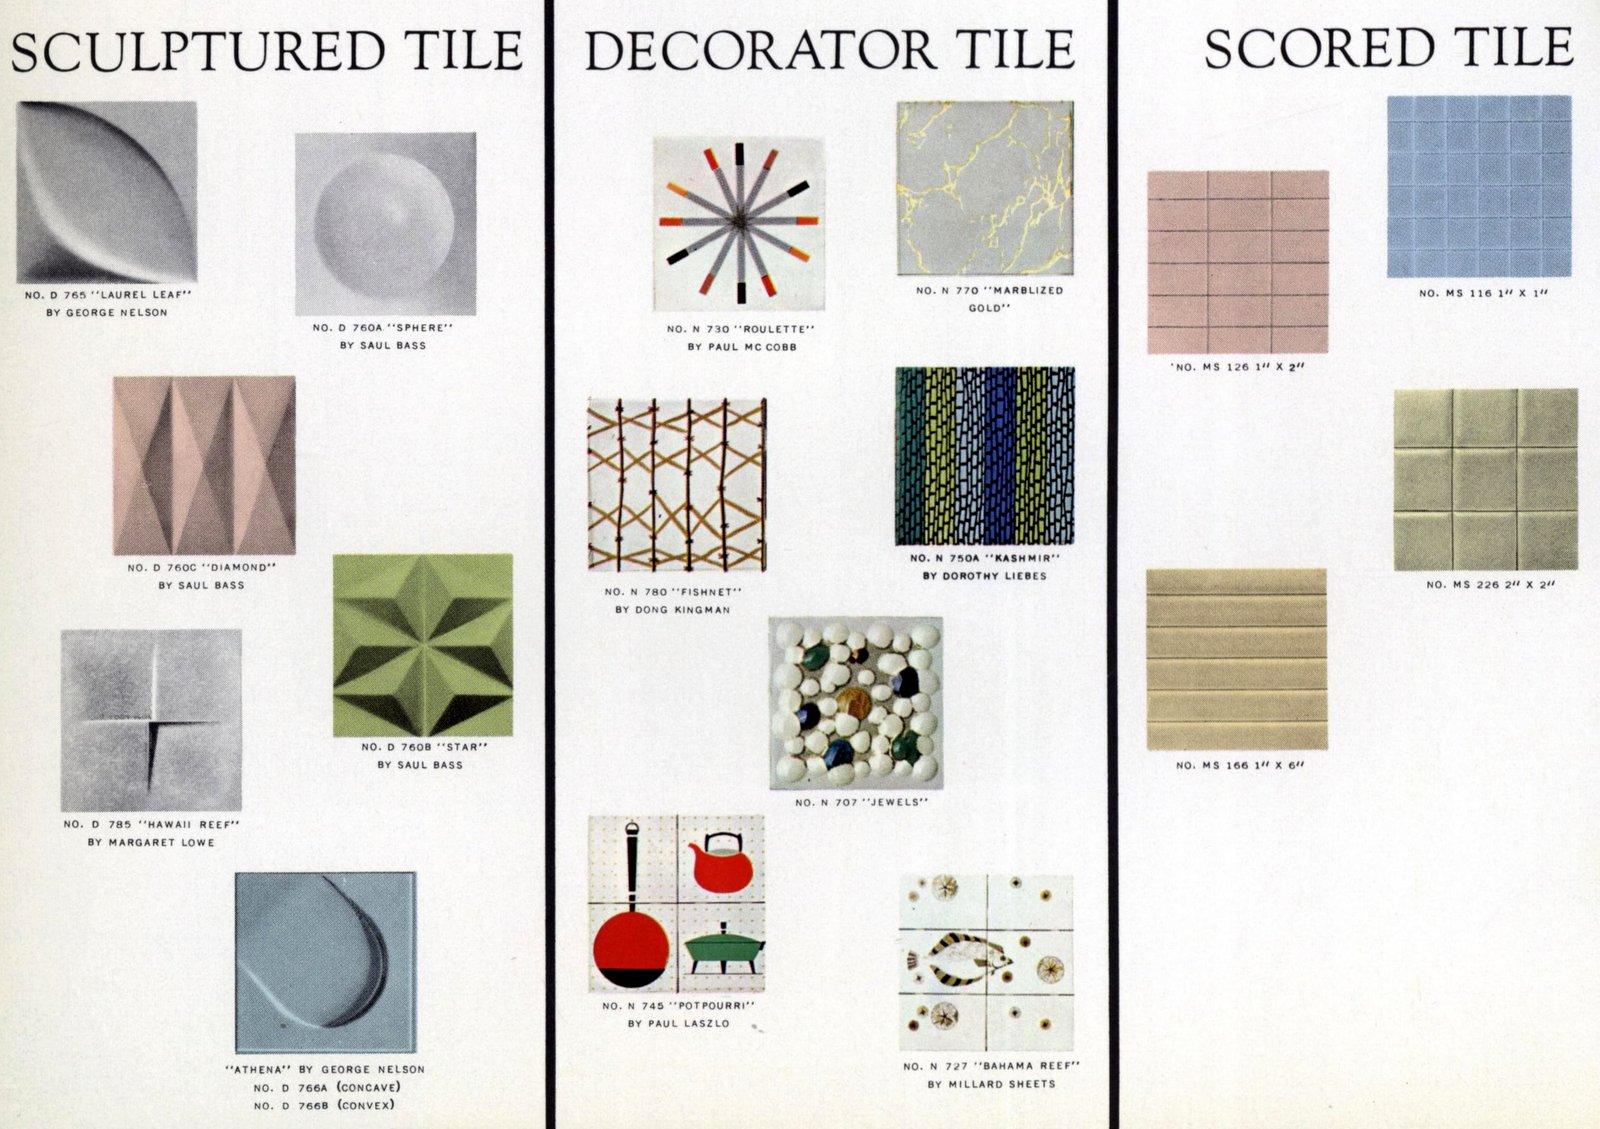 Pomona tile designs from 1961